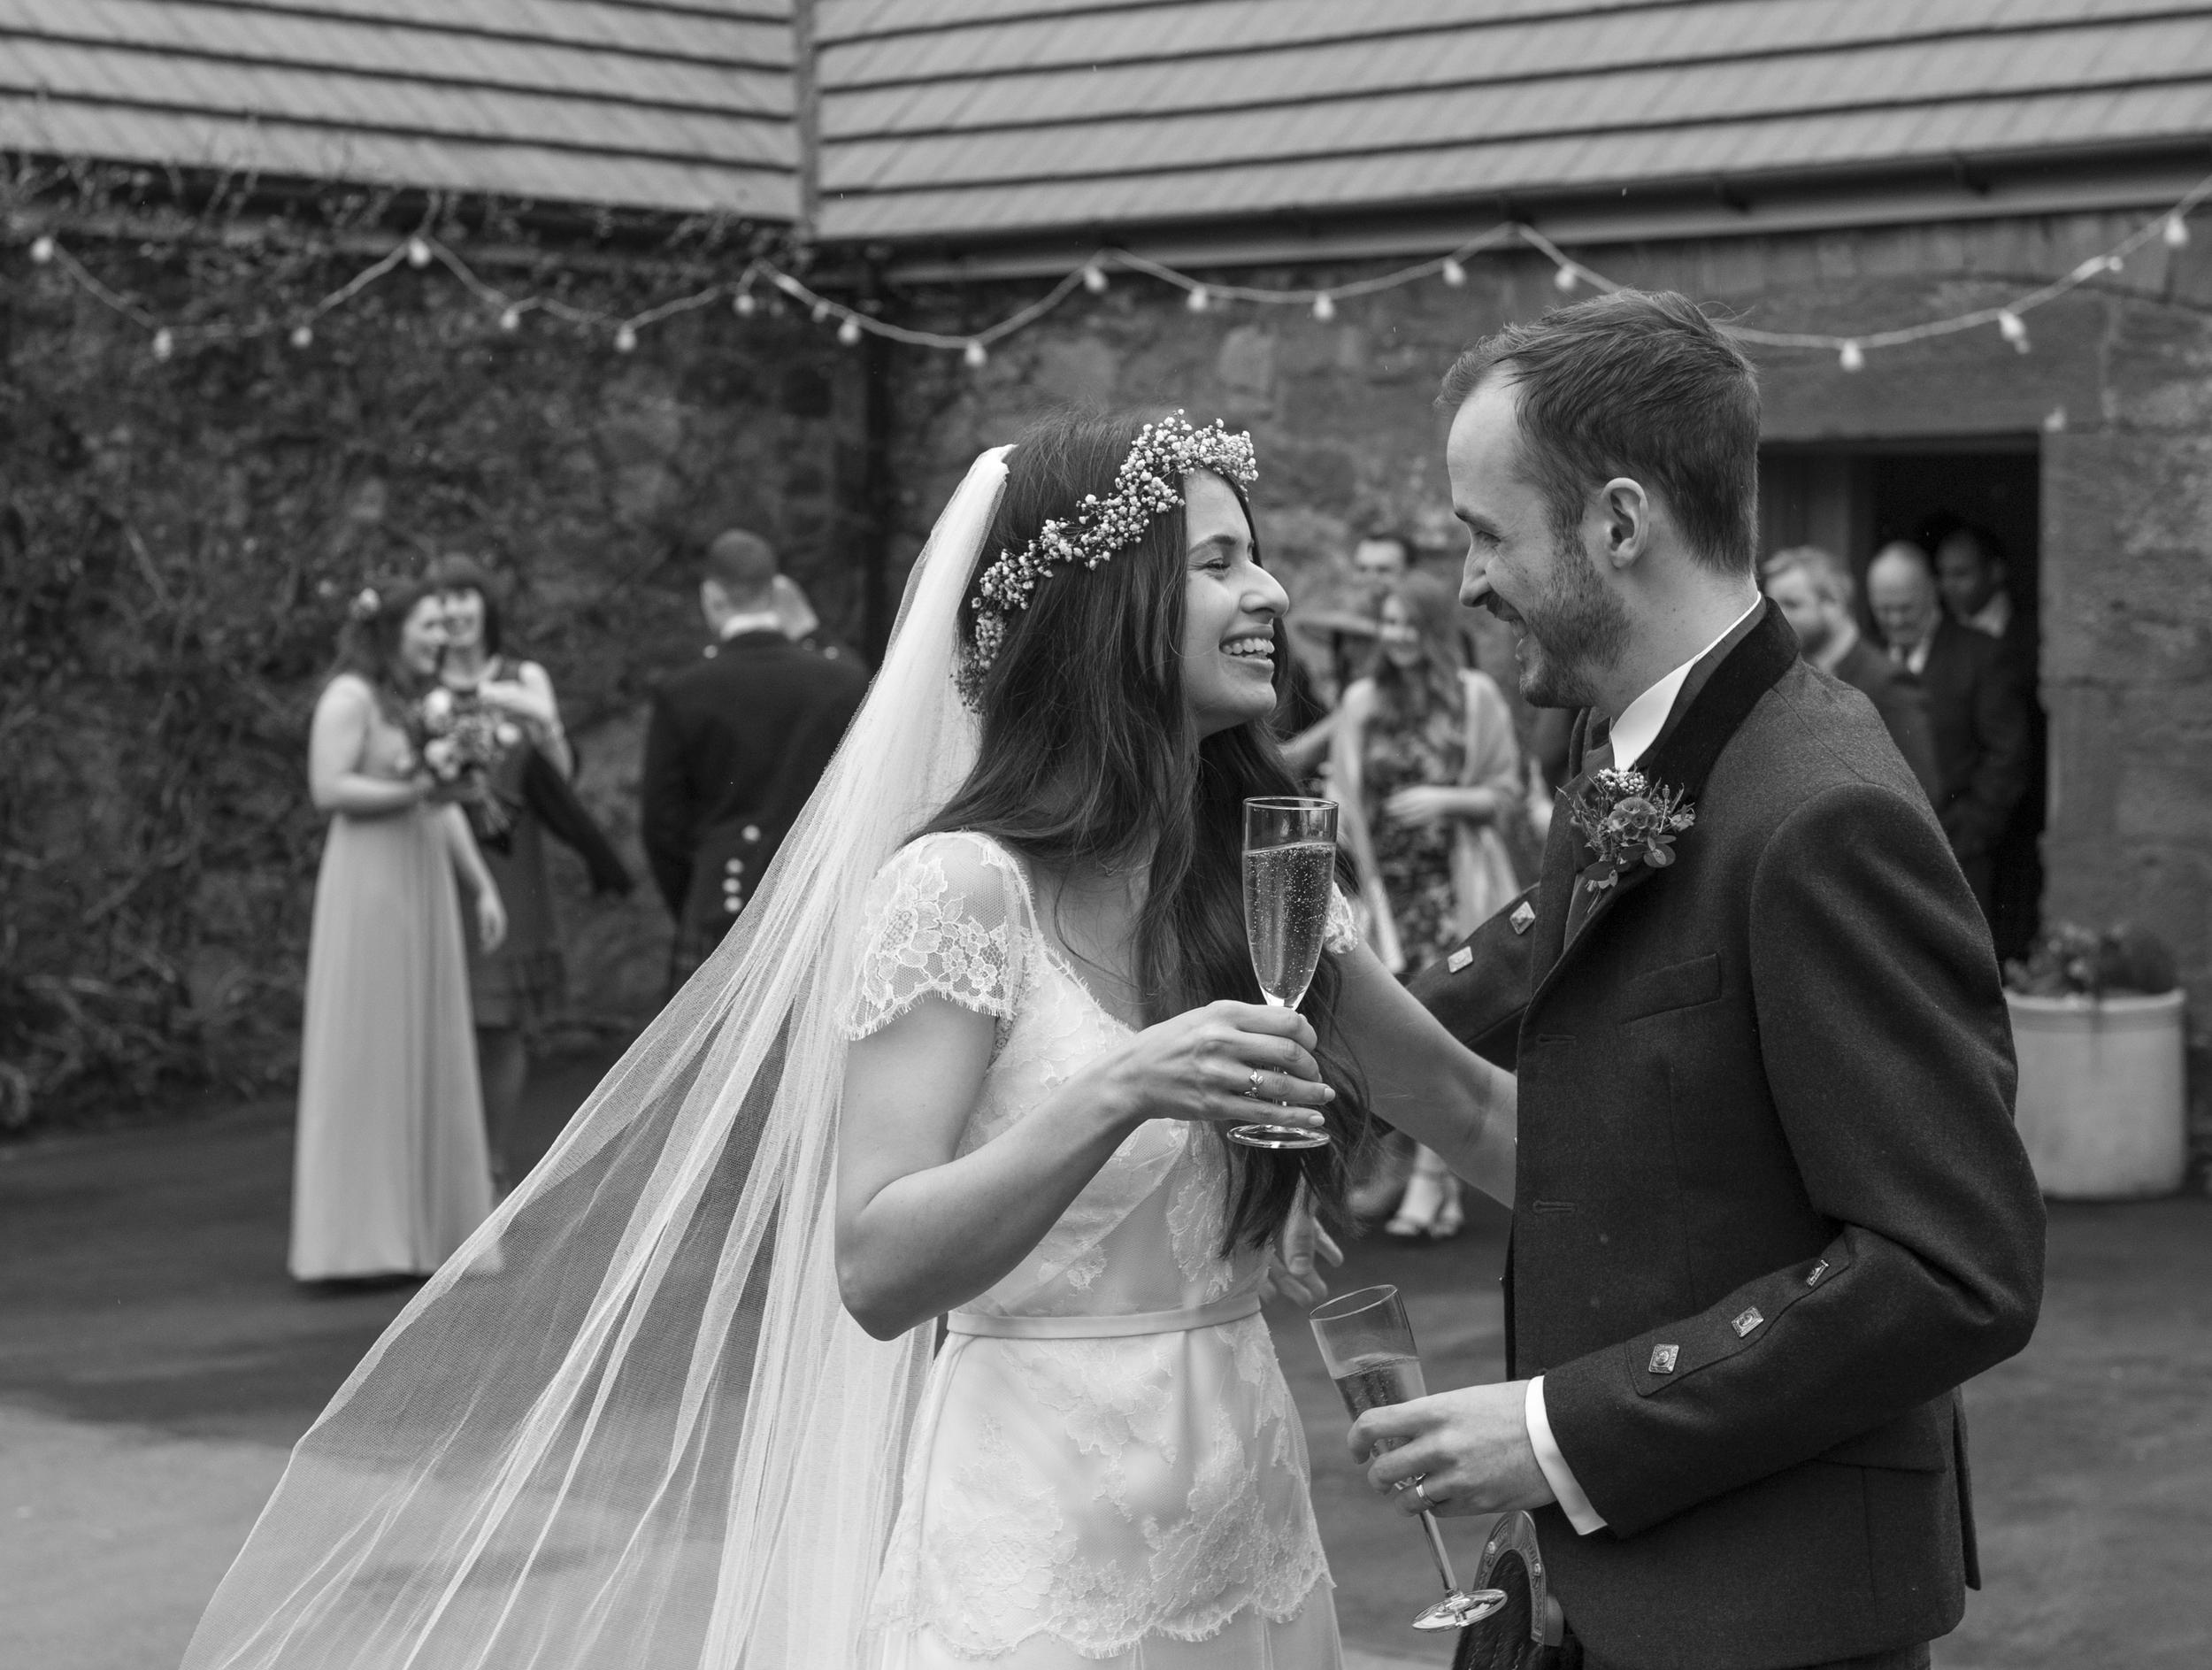 Stunning Fiona wears the Halfpenny London Fifi wedding dress on her big day